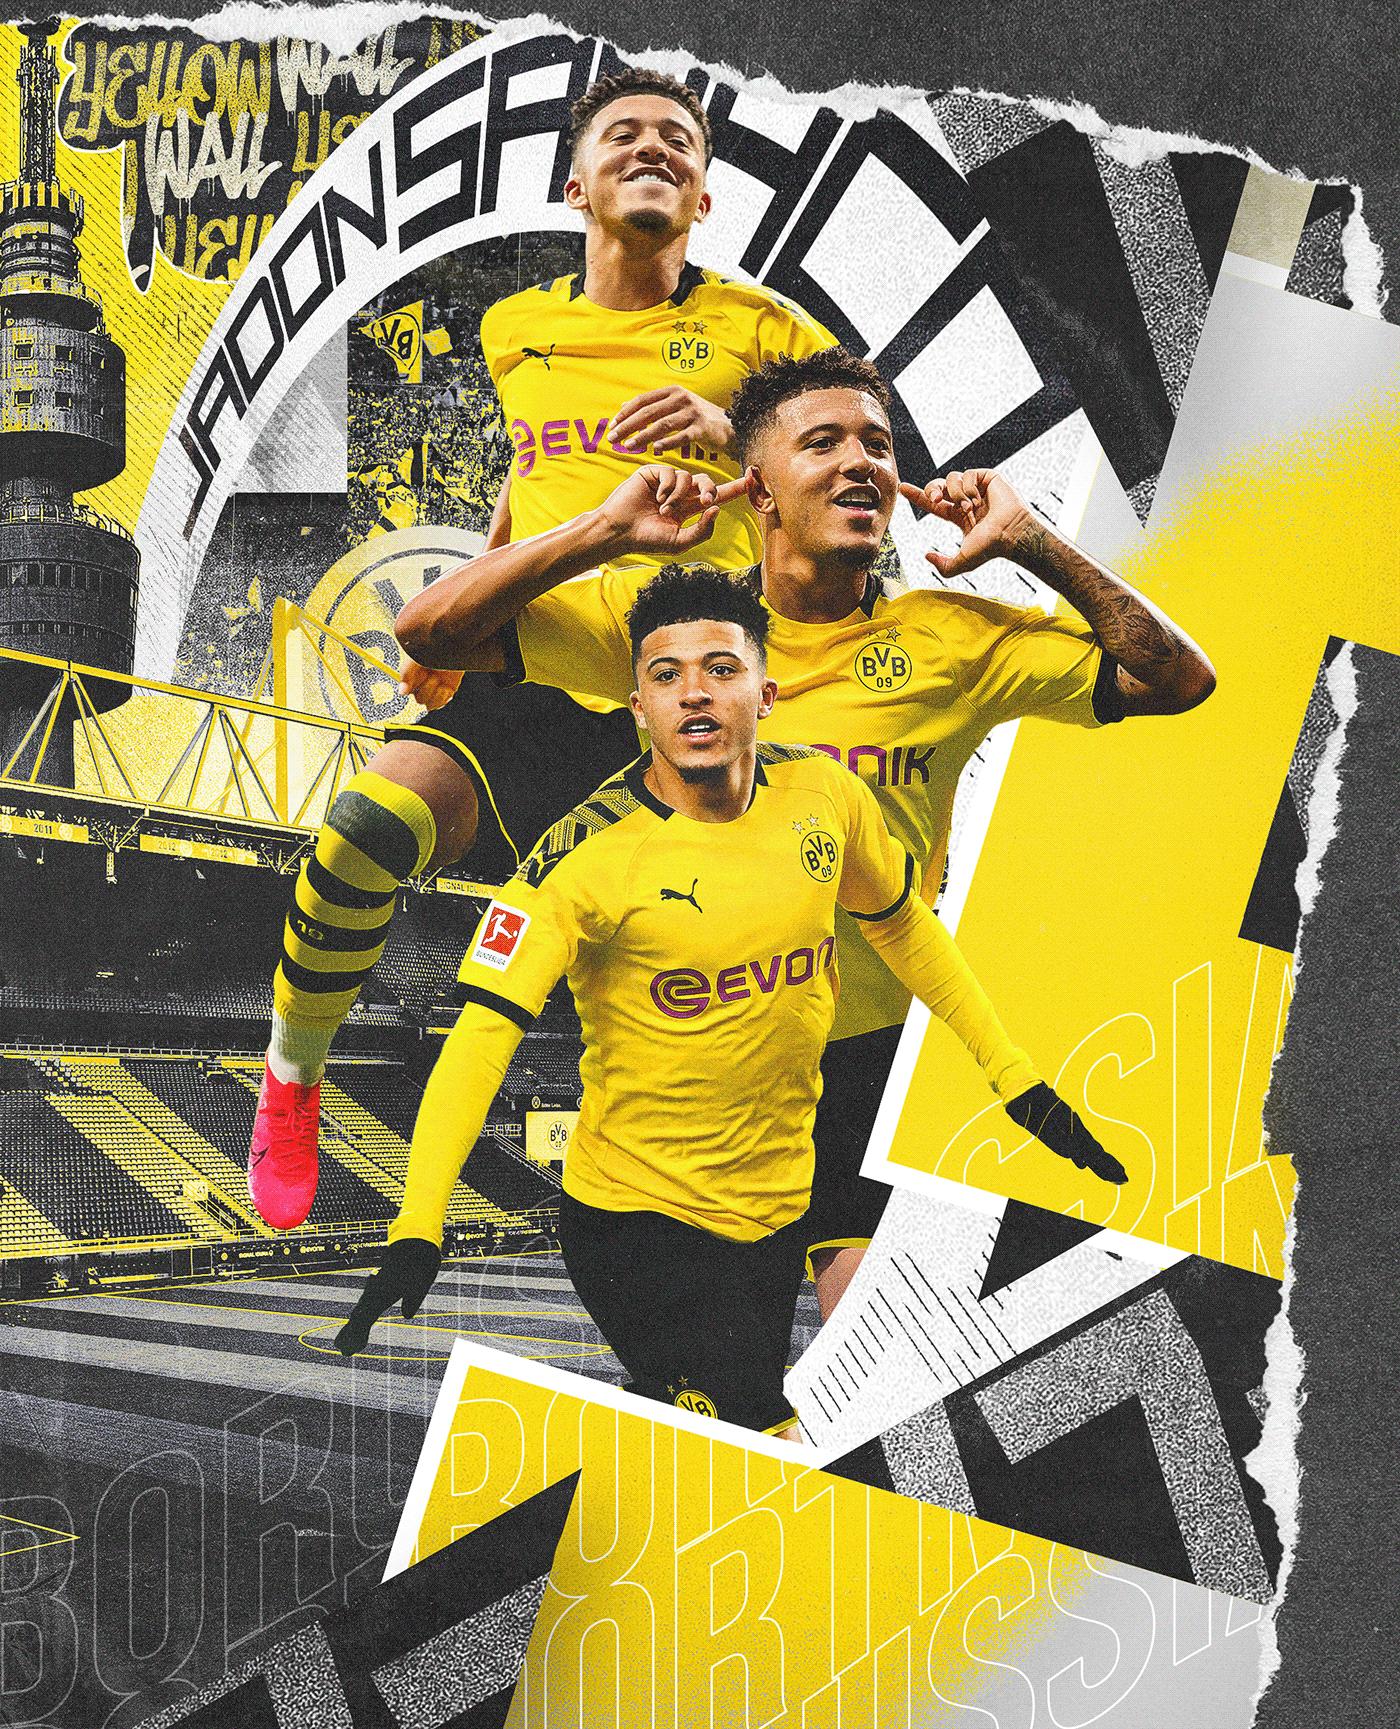 Sport Posters Design Football on Behance в 2020 г